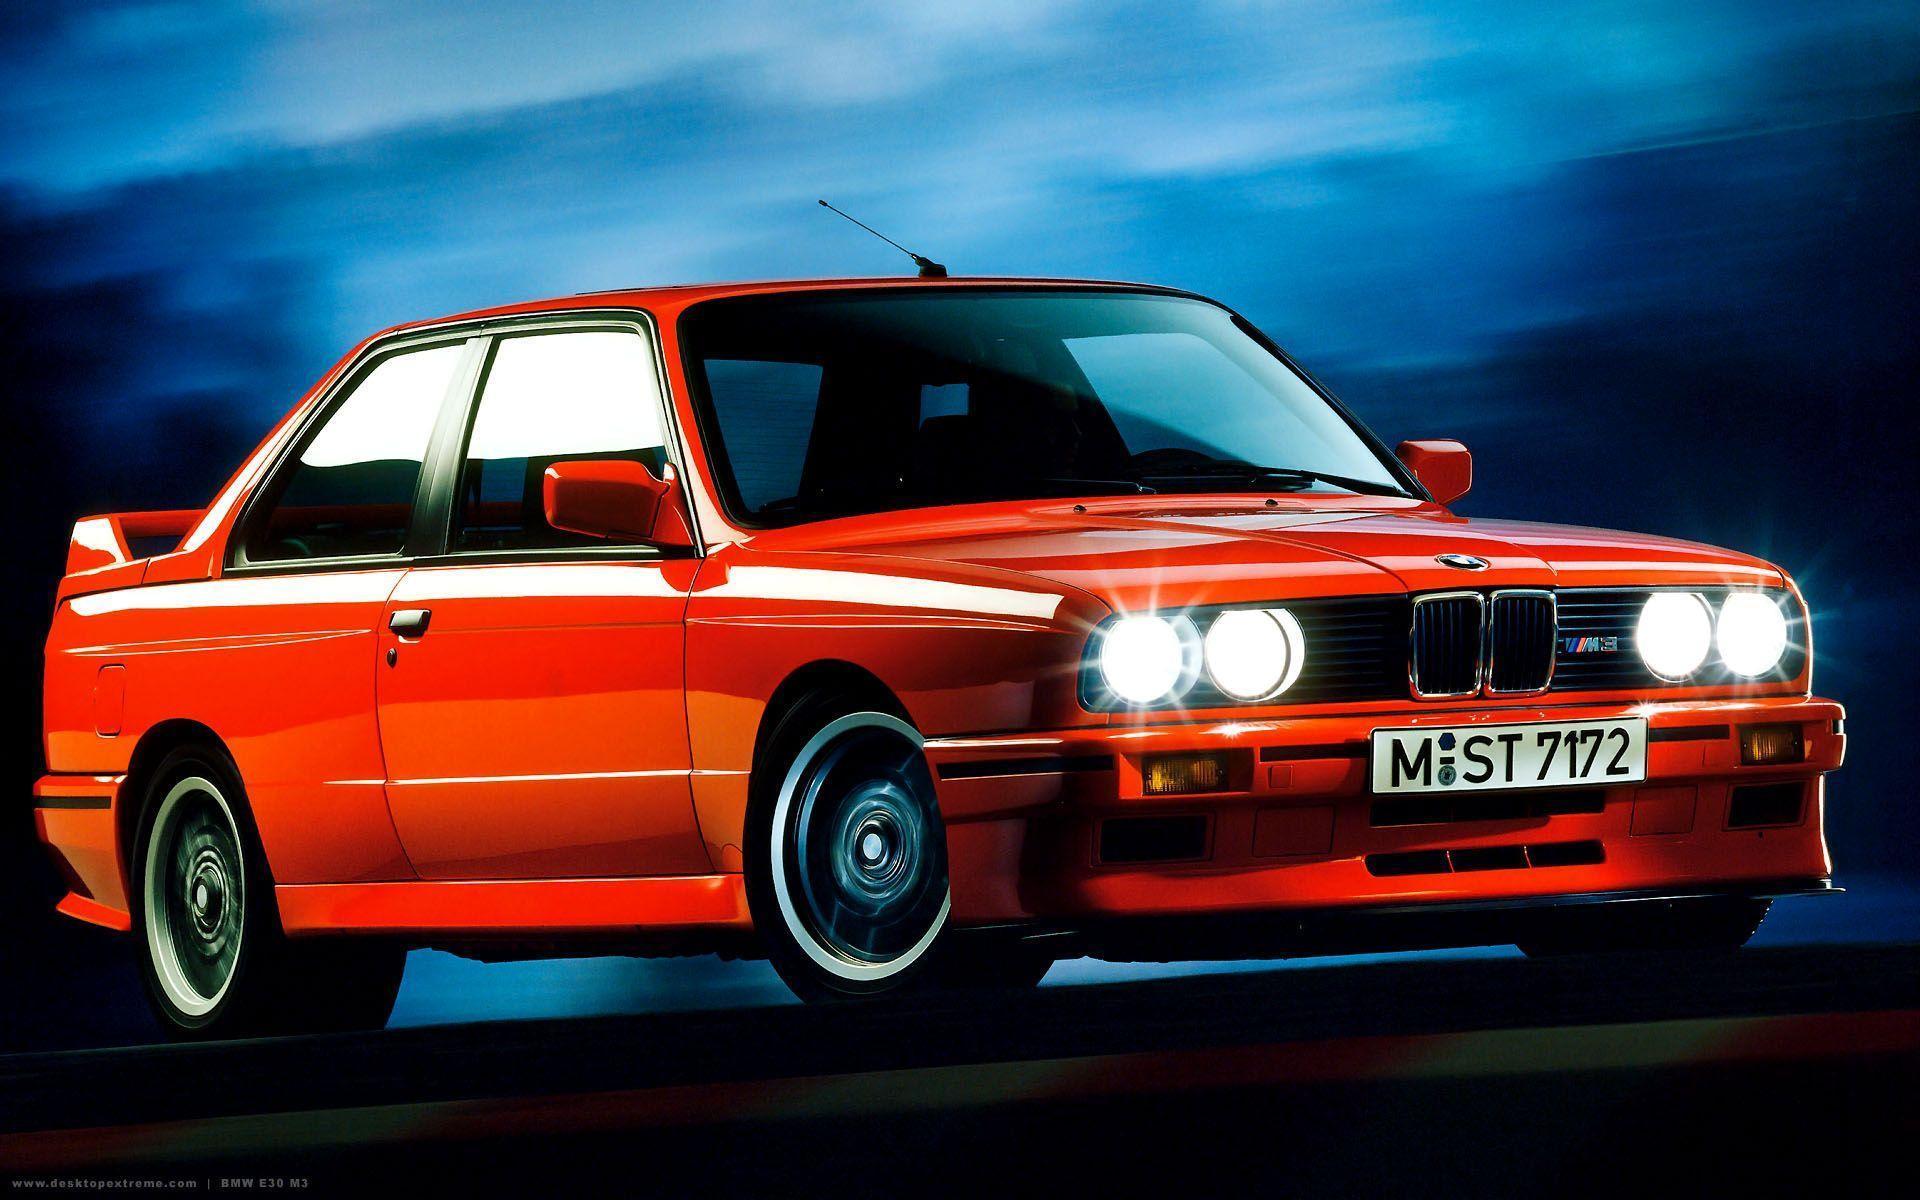 BMW E30 M3 Wallpapers - Wallpaper Cave